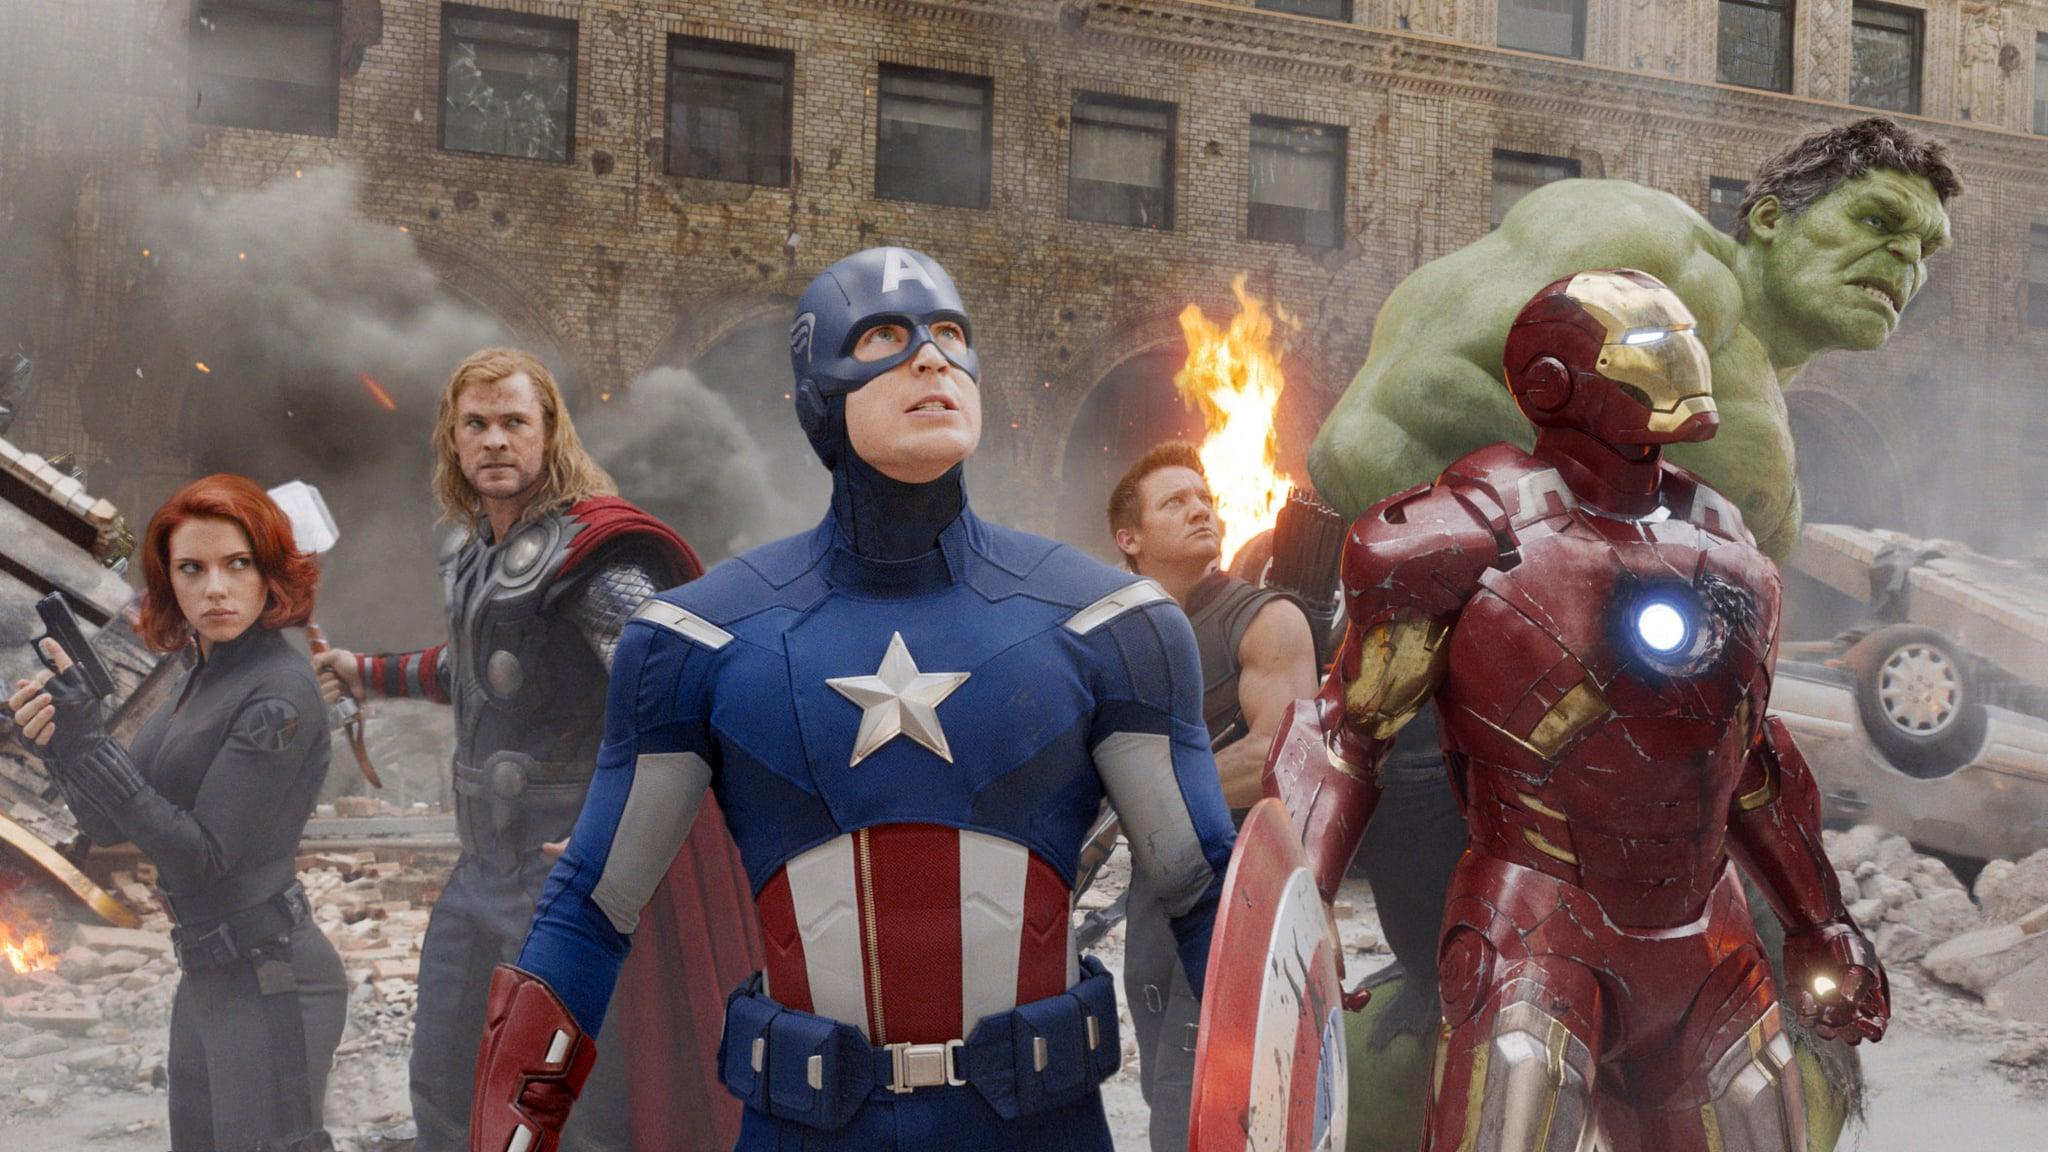 THE AVENGERS, from left: Scarlett Johansson as Black Widow, Chris Hemsworth as Thor, Chris Evans as Captain America, Jeremy Renner as Hawkeye, Robert Downey Jr as Iron Man, Mark Ruffalo as The Hulk, 2012. Walt Disney Studios Motion Pictures/courtesy Everett Collection